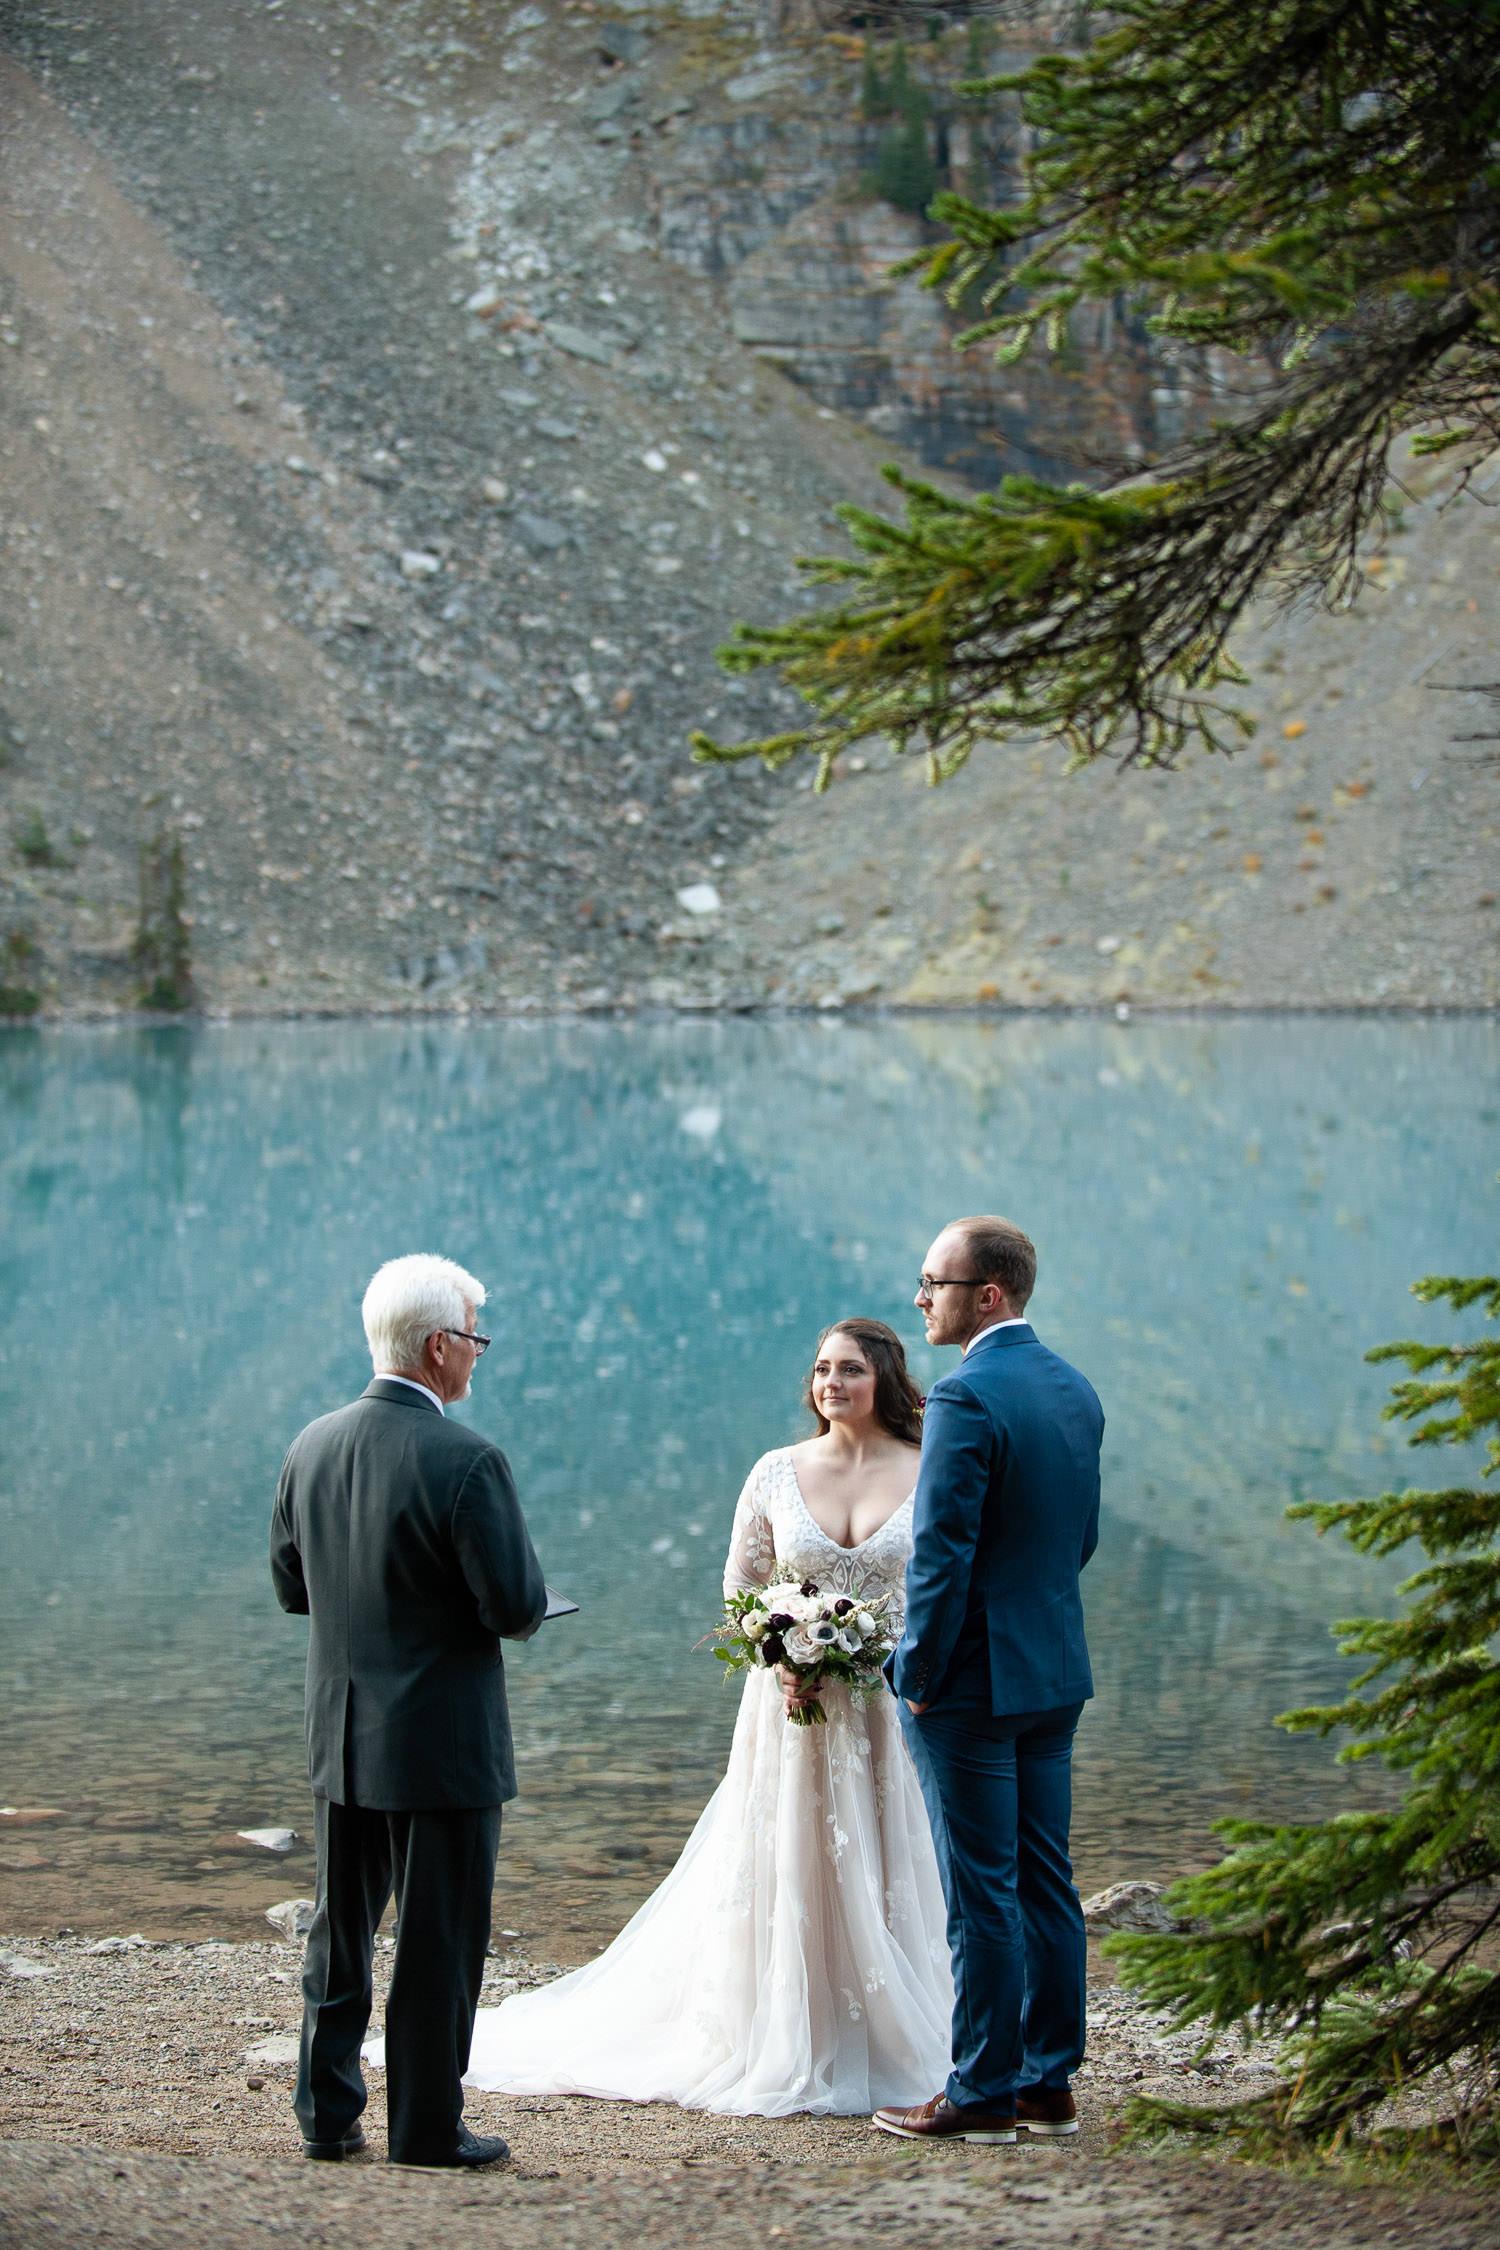 Wedding ceremony at Moraine Lake captured by Tara Whittaker Photography